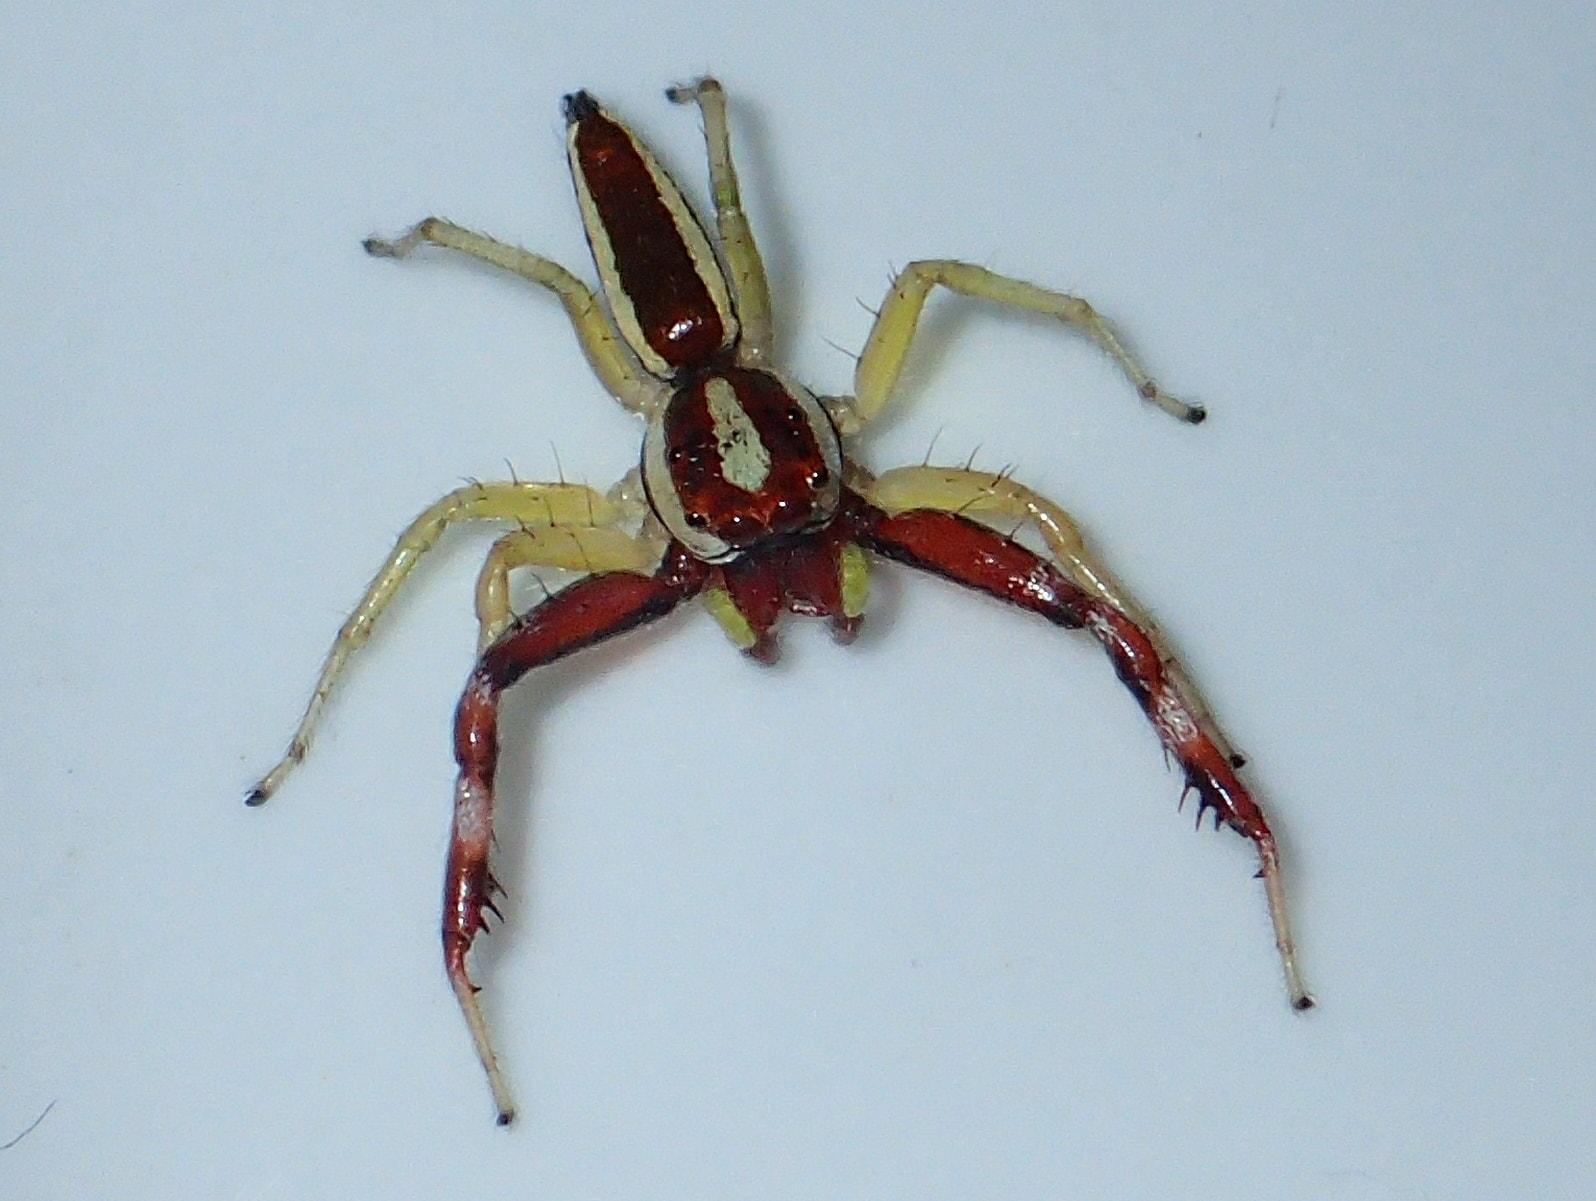 Picture of Epocilla (Orange Jumping Spiders) - Male - Dorsal